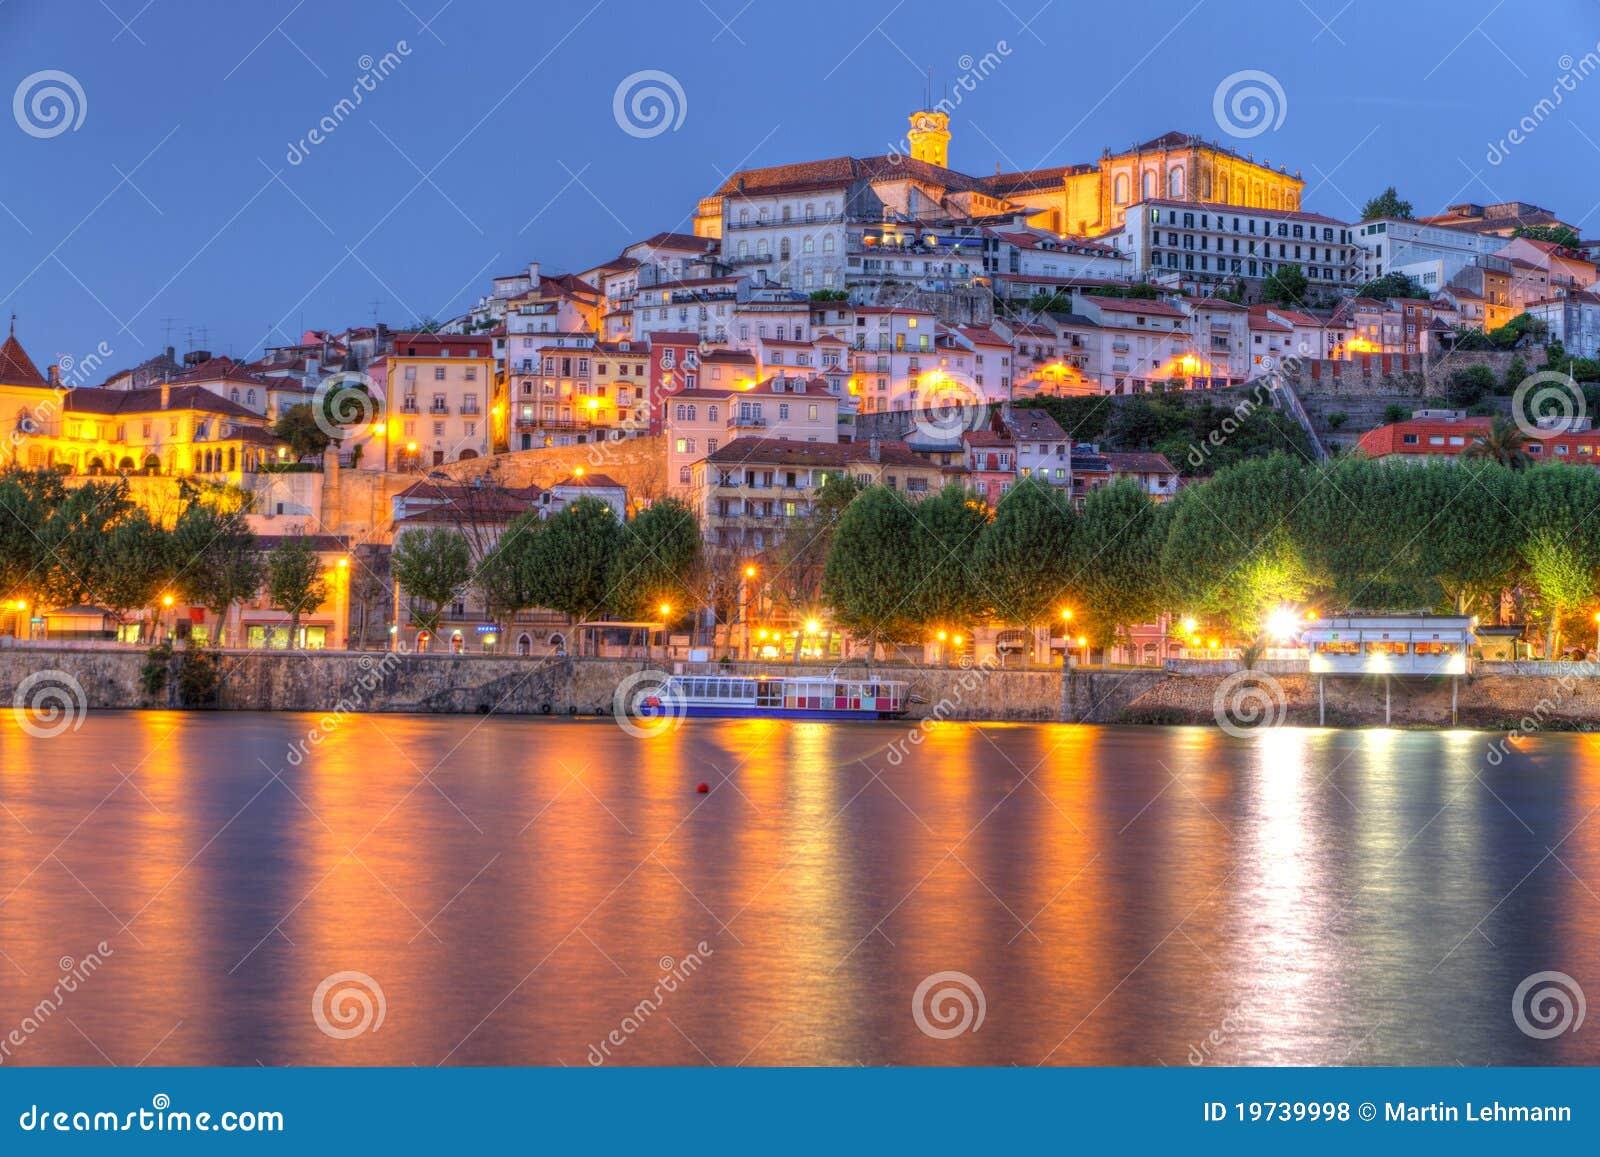 Coimbra magnetportugal turist